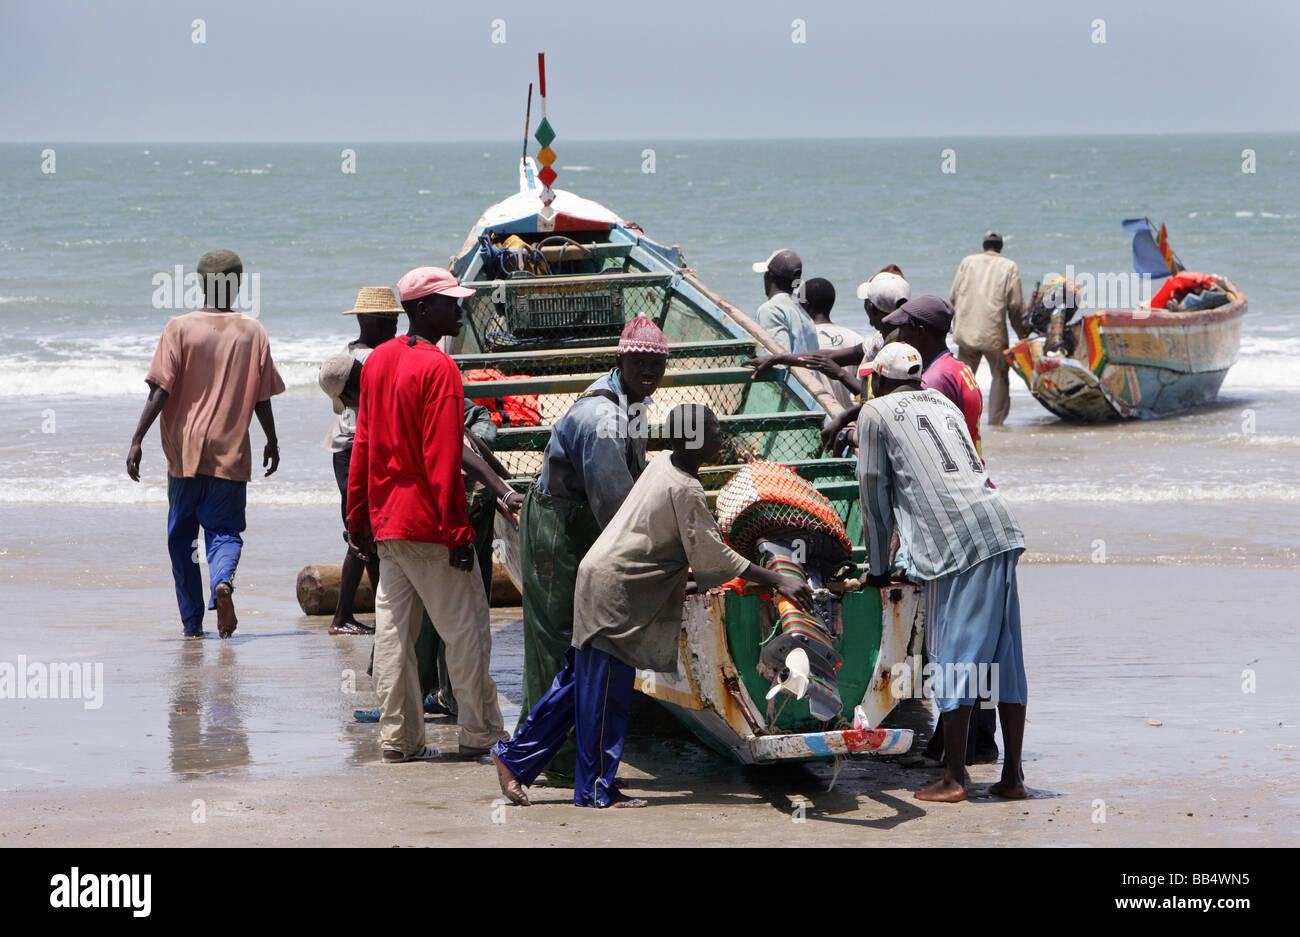 Fishermen bring a boat up onto the shore at Kap Skirring, Senegal - Stock Image